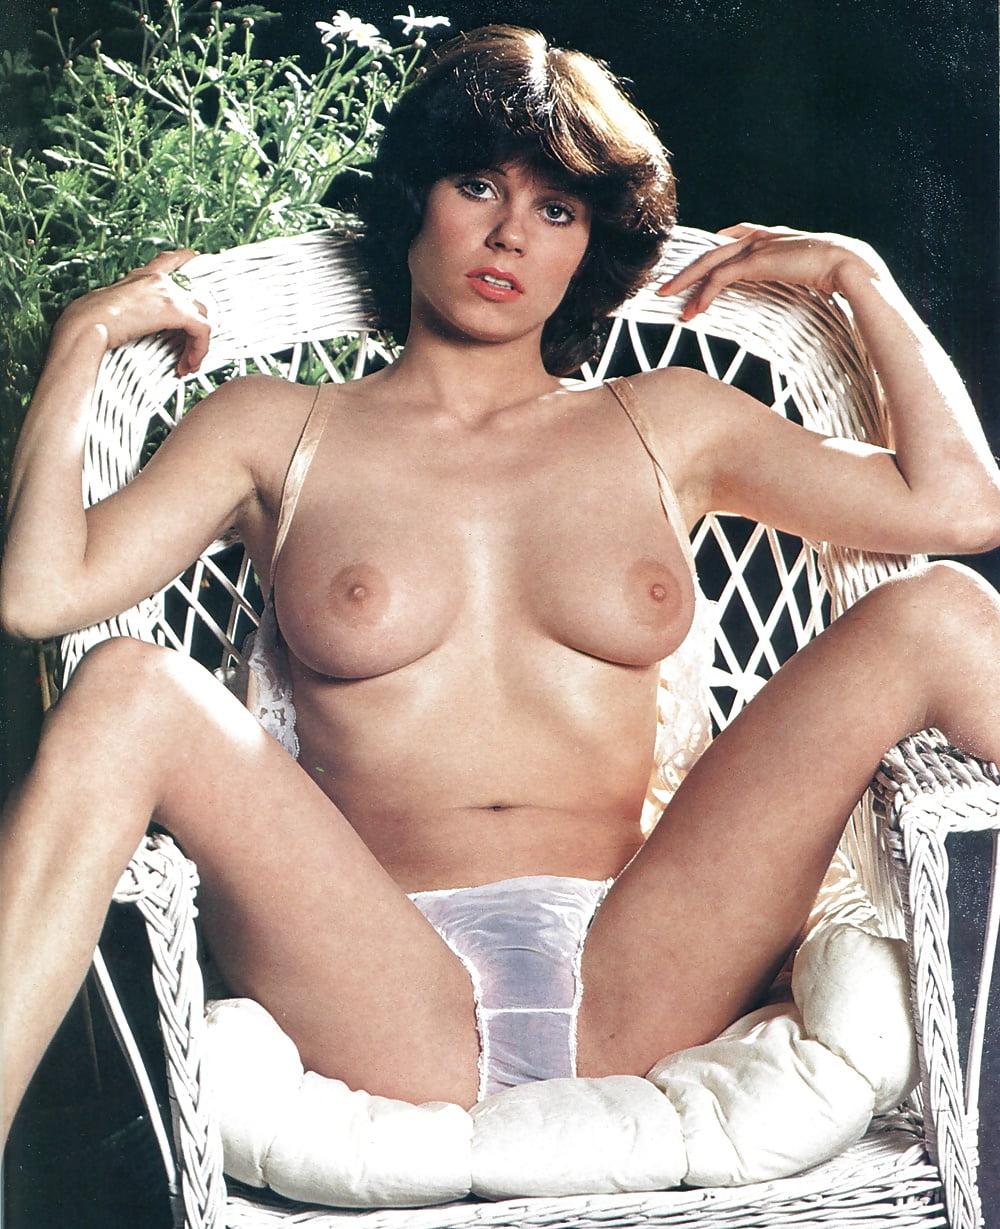 adrienne-barbeau-naked-pics-sex-on-fire-original